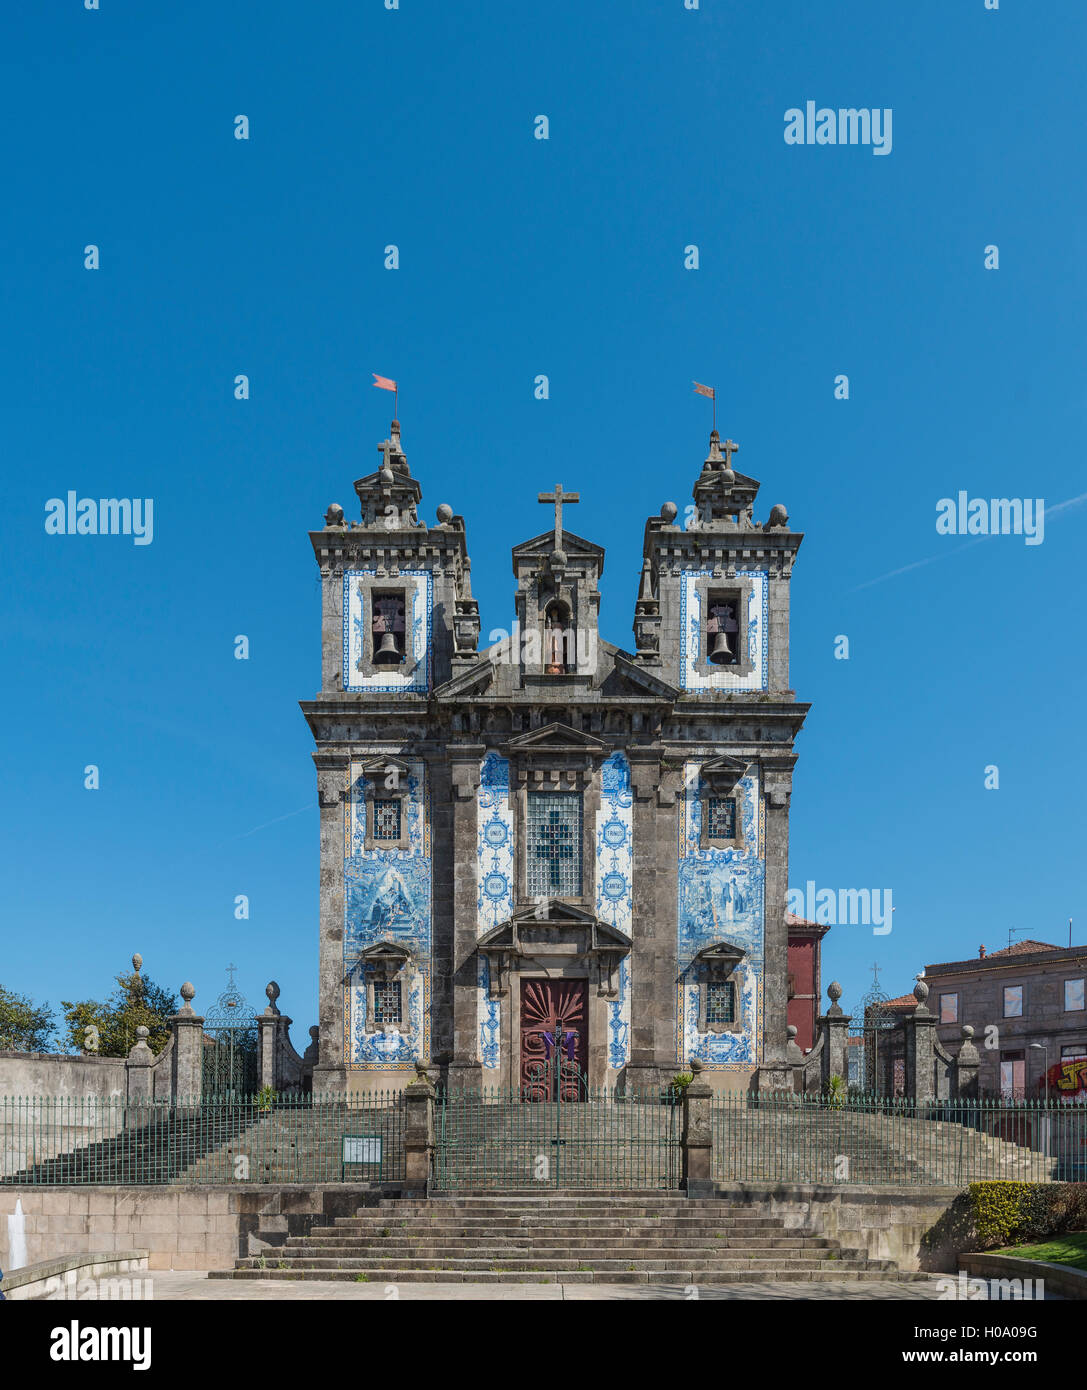 Igreja de Santo IIdefonso, church, Porto, Portugal - Stock Image